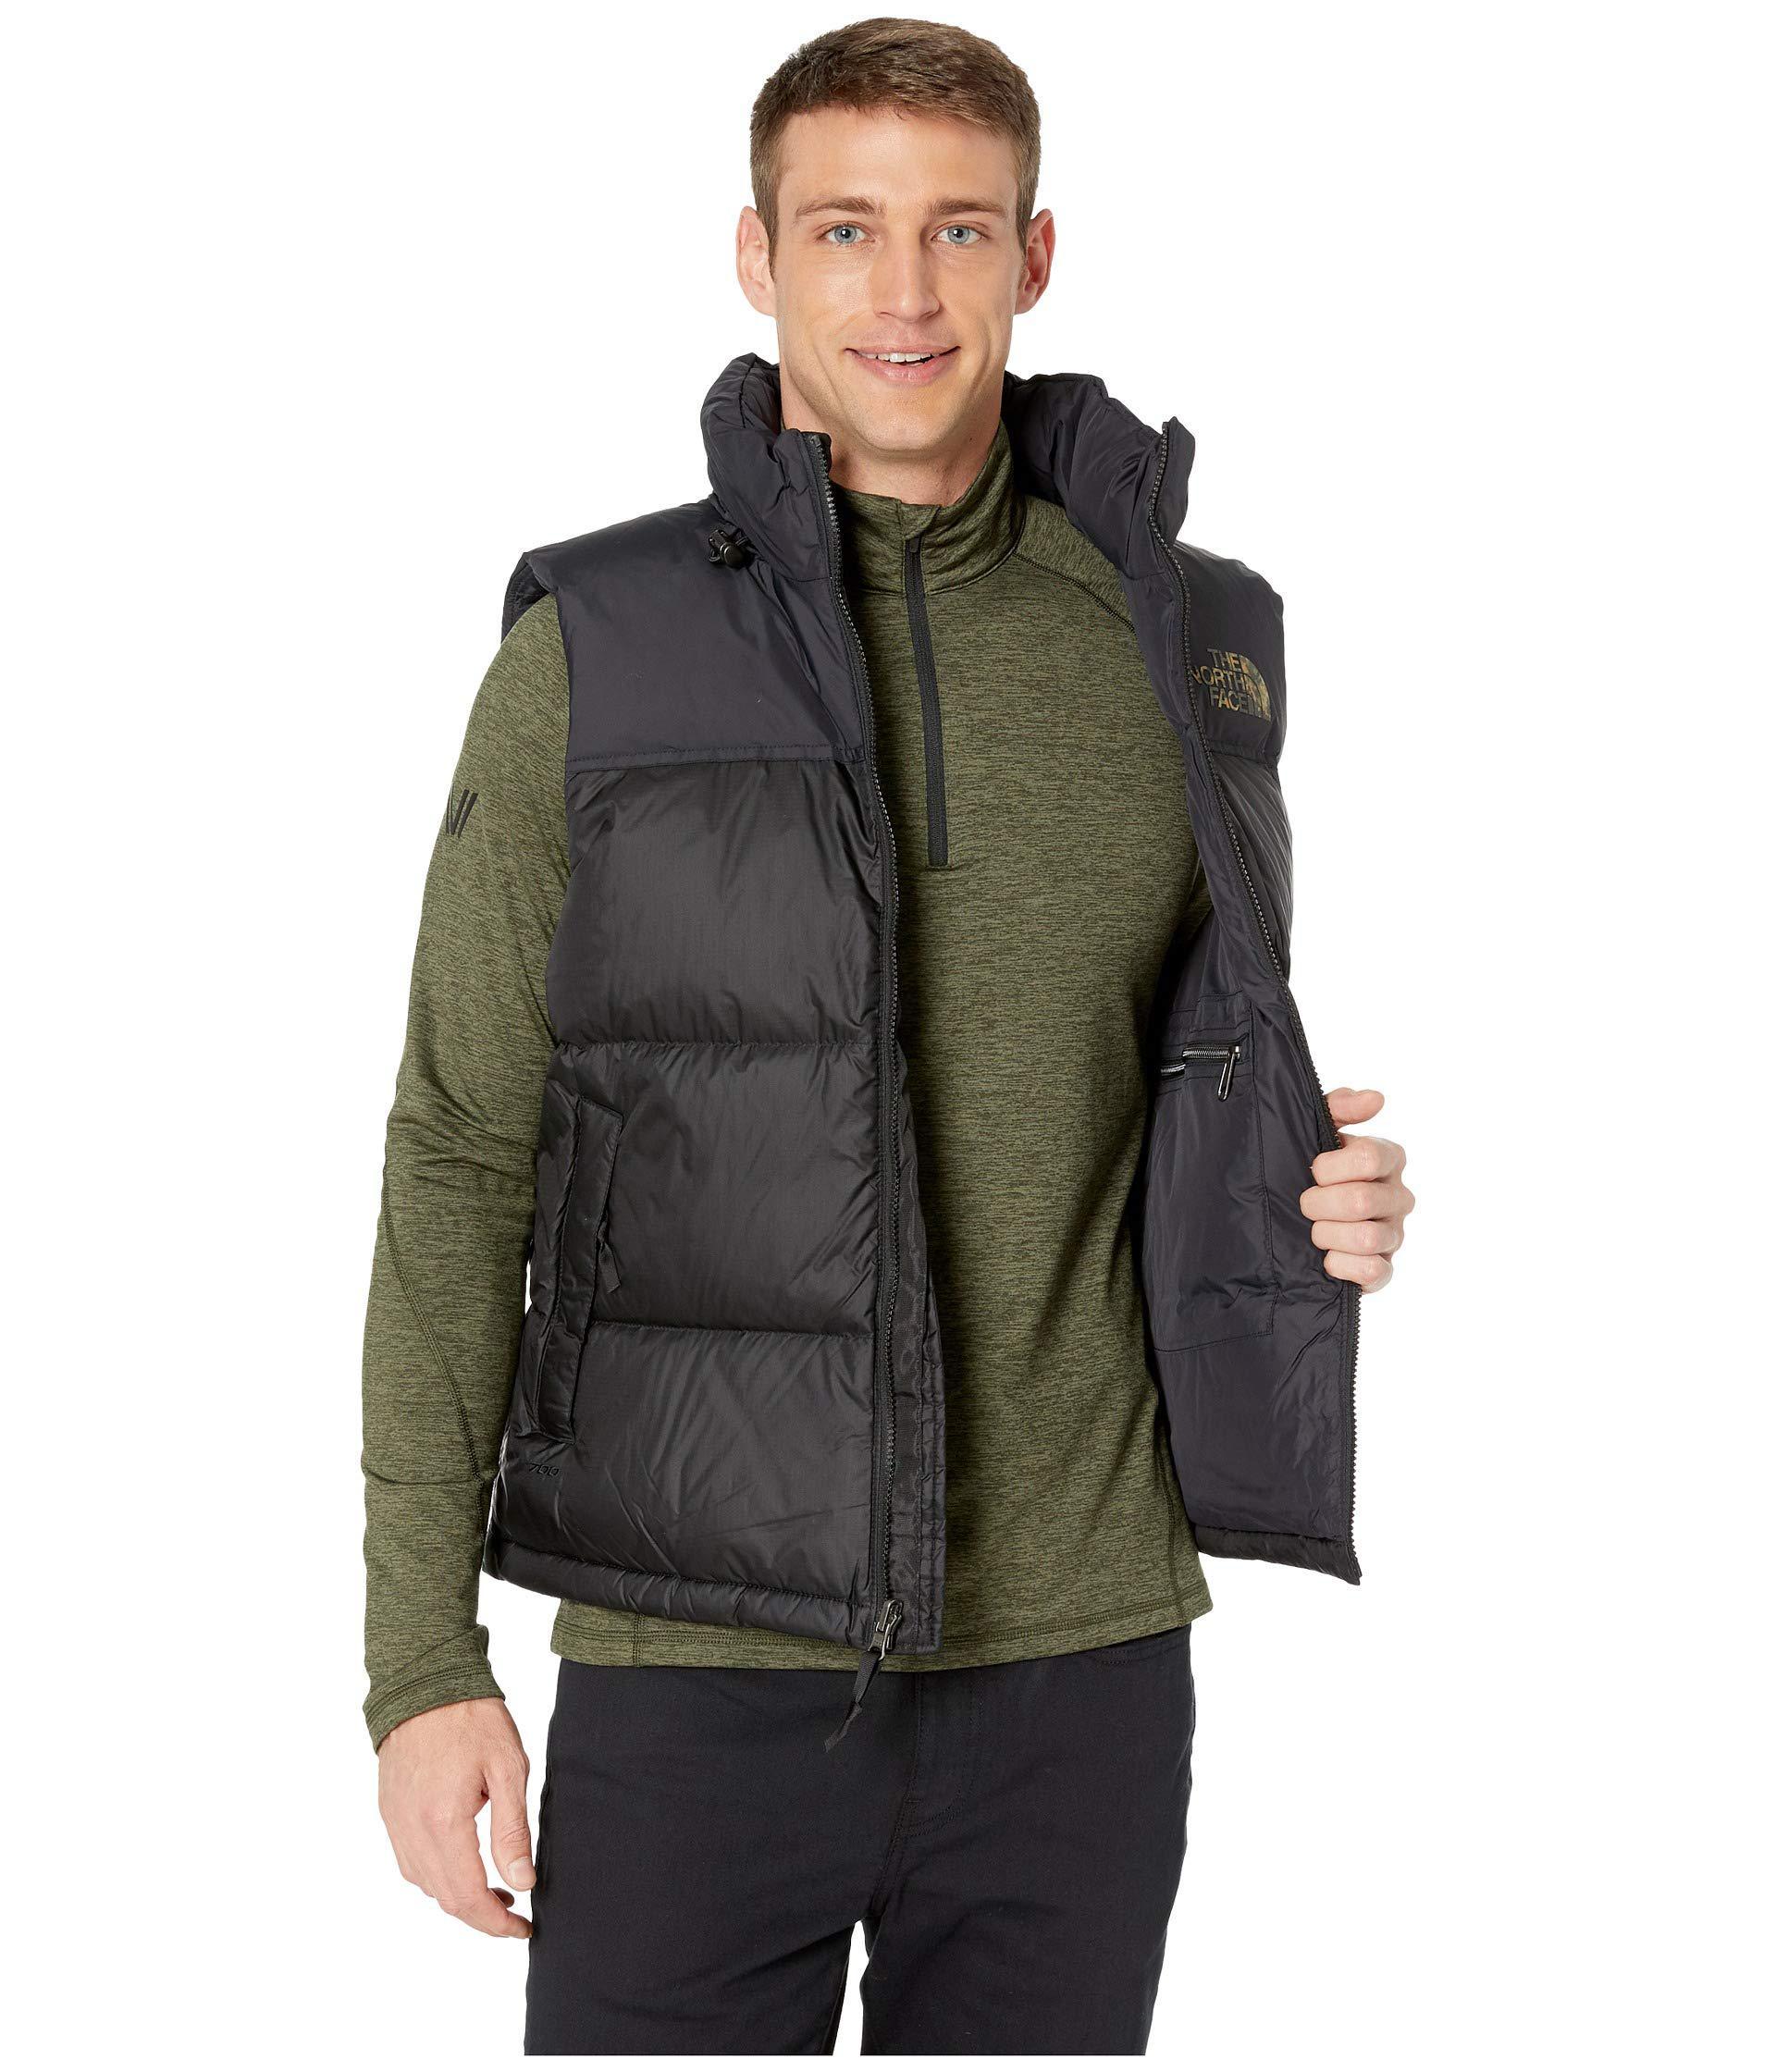 9f4c2c8302aa ... Novelty Nuptse Vest (tnf Black Macrofleck Print) Men s. View fullscreen